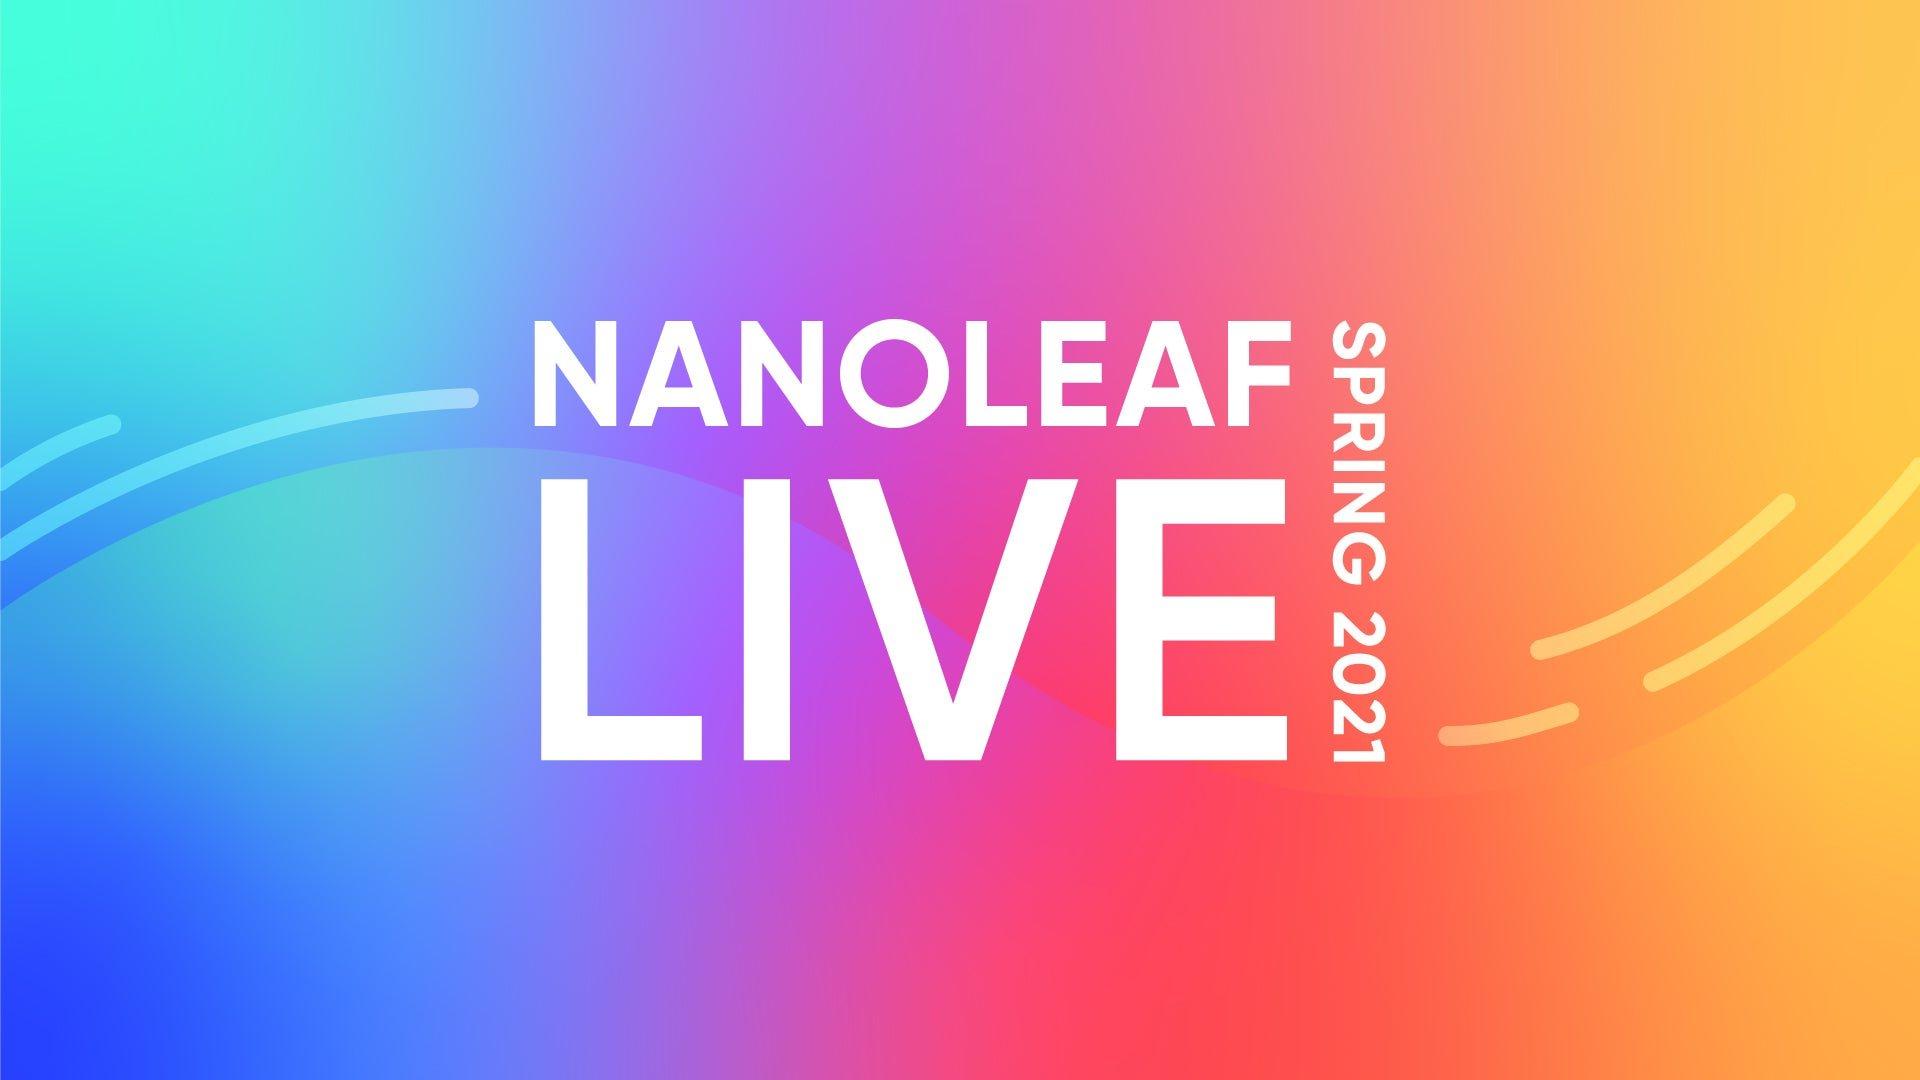 YOU DESERVE LIVE Our live virtual event NANOLEAF LIVE SPRING